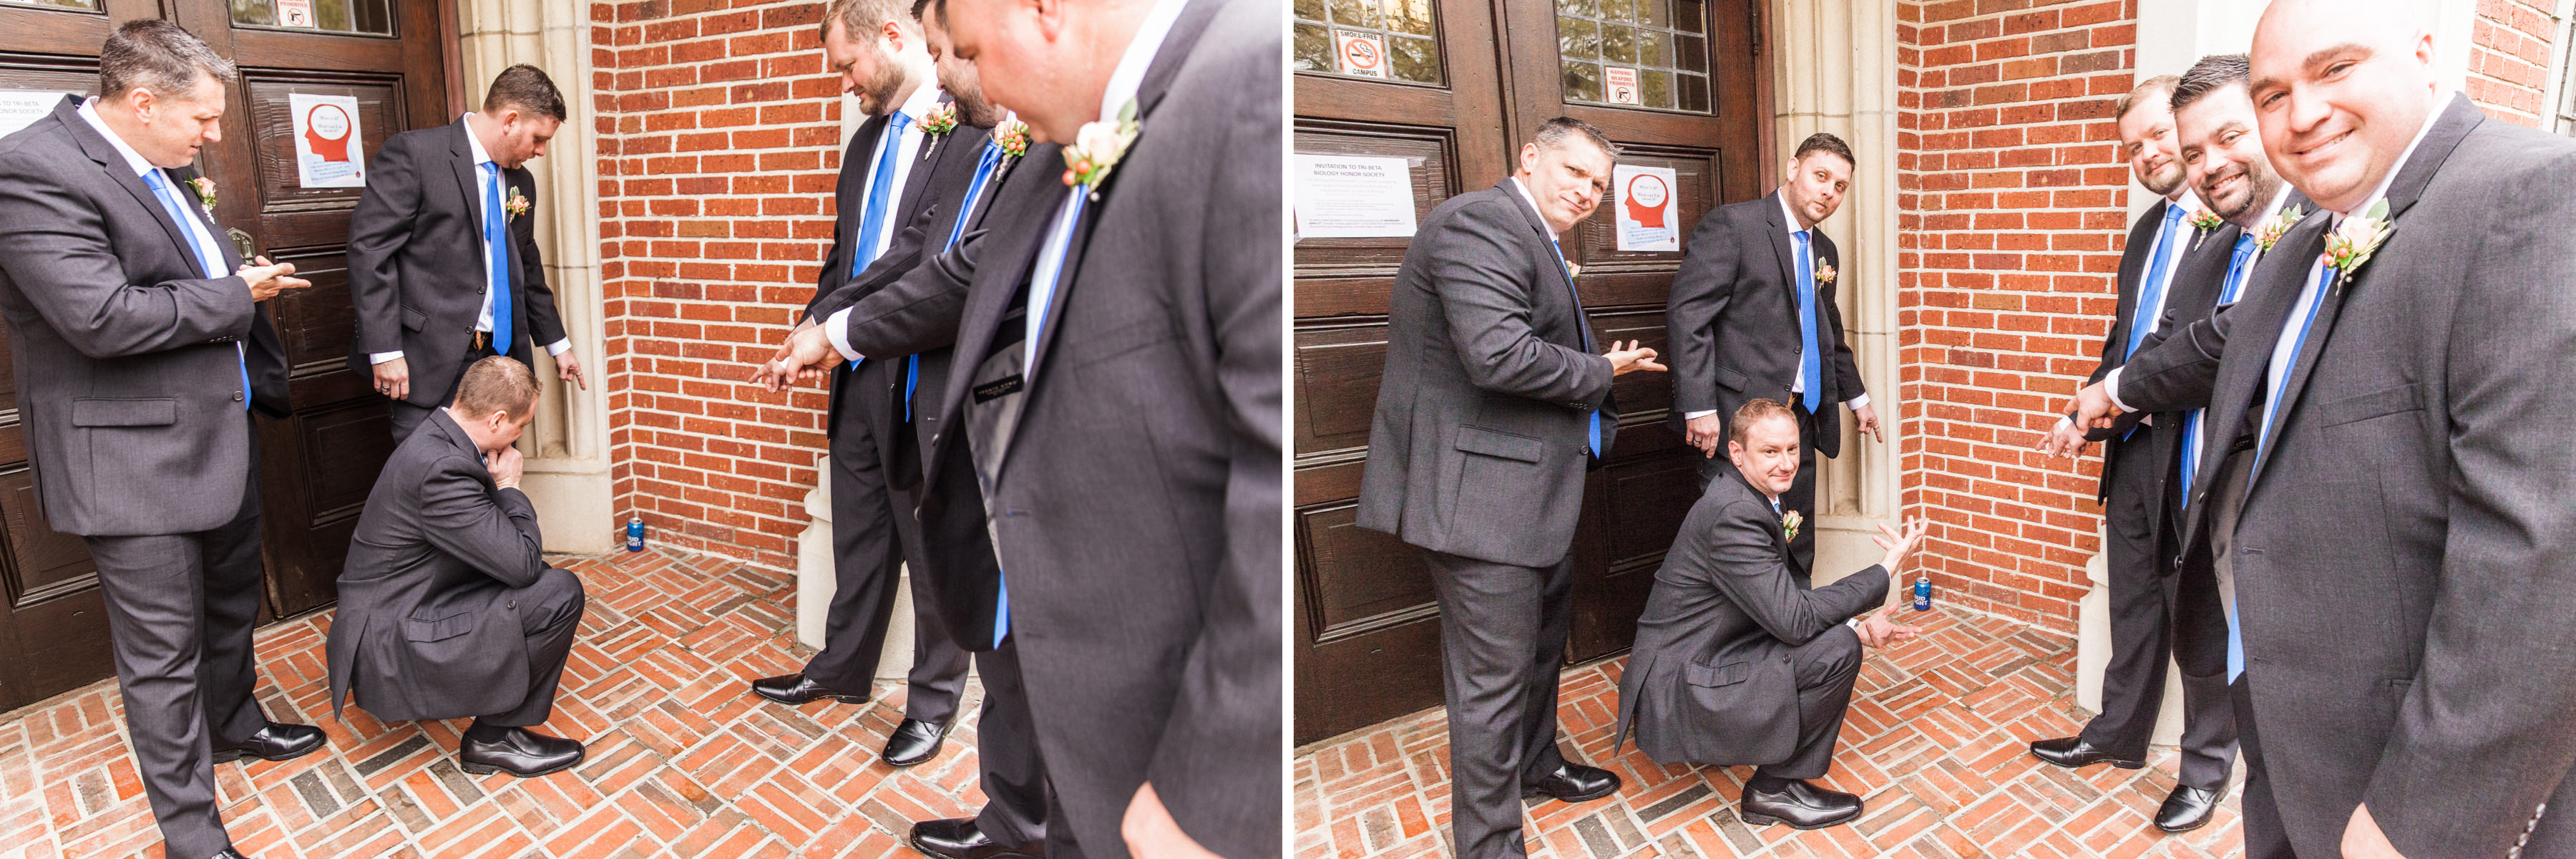 MAULDIN_WEDDING_MONTGOMERY_ALABAMA_WEDDING_PHOTOGRAPHY_47